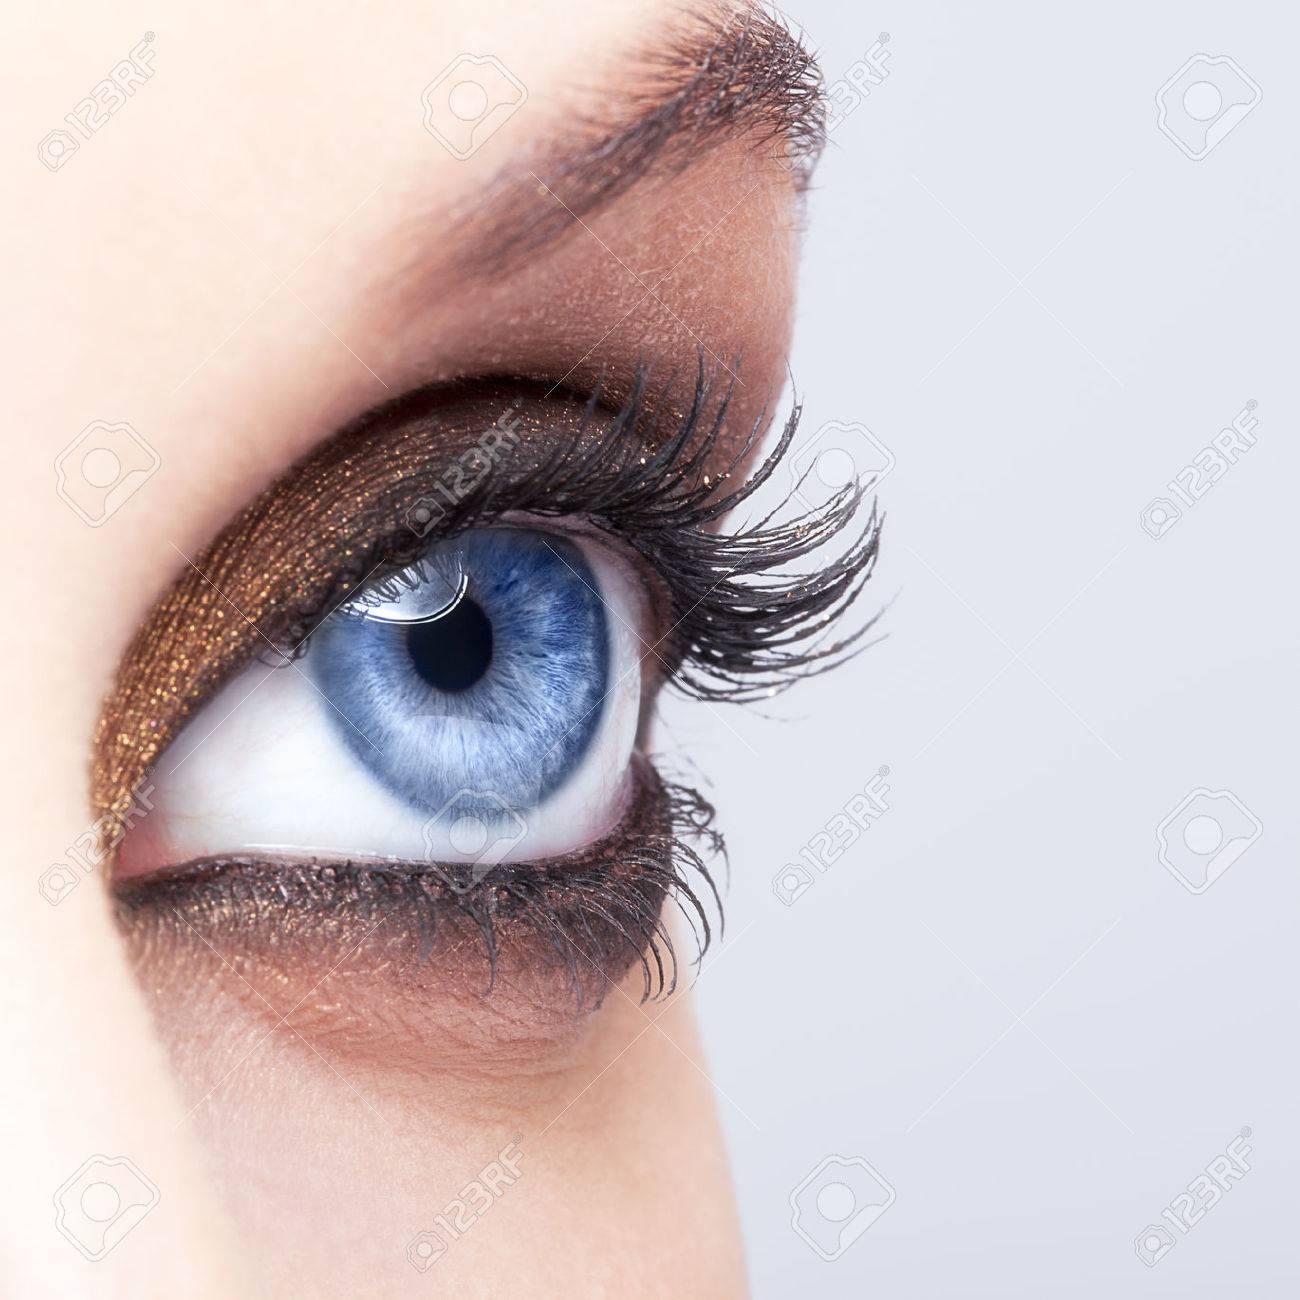 Close-up shot of female eye make-up in smoky eyes style - 43889263